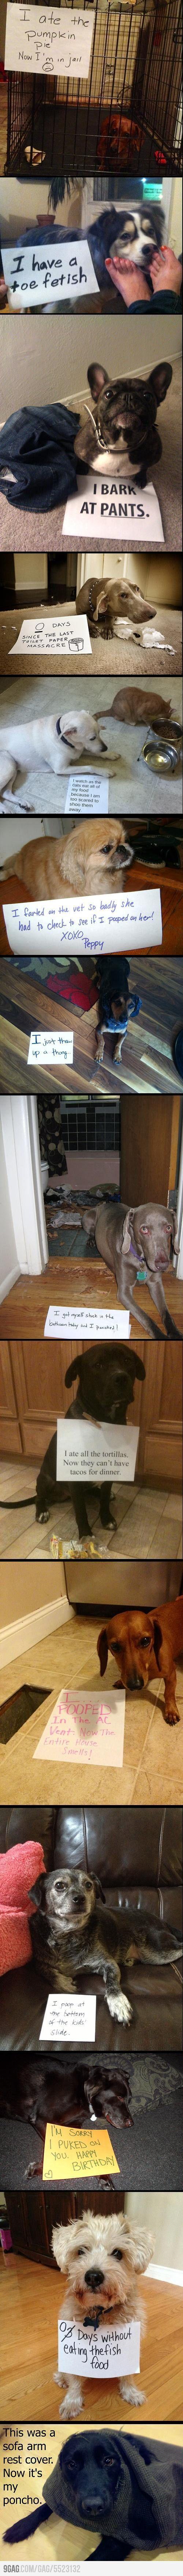 Dog Shaming.